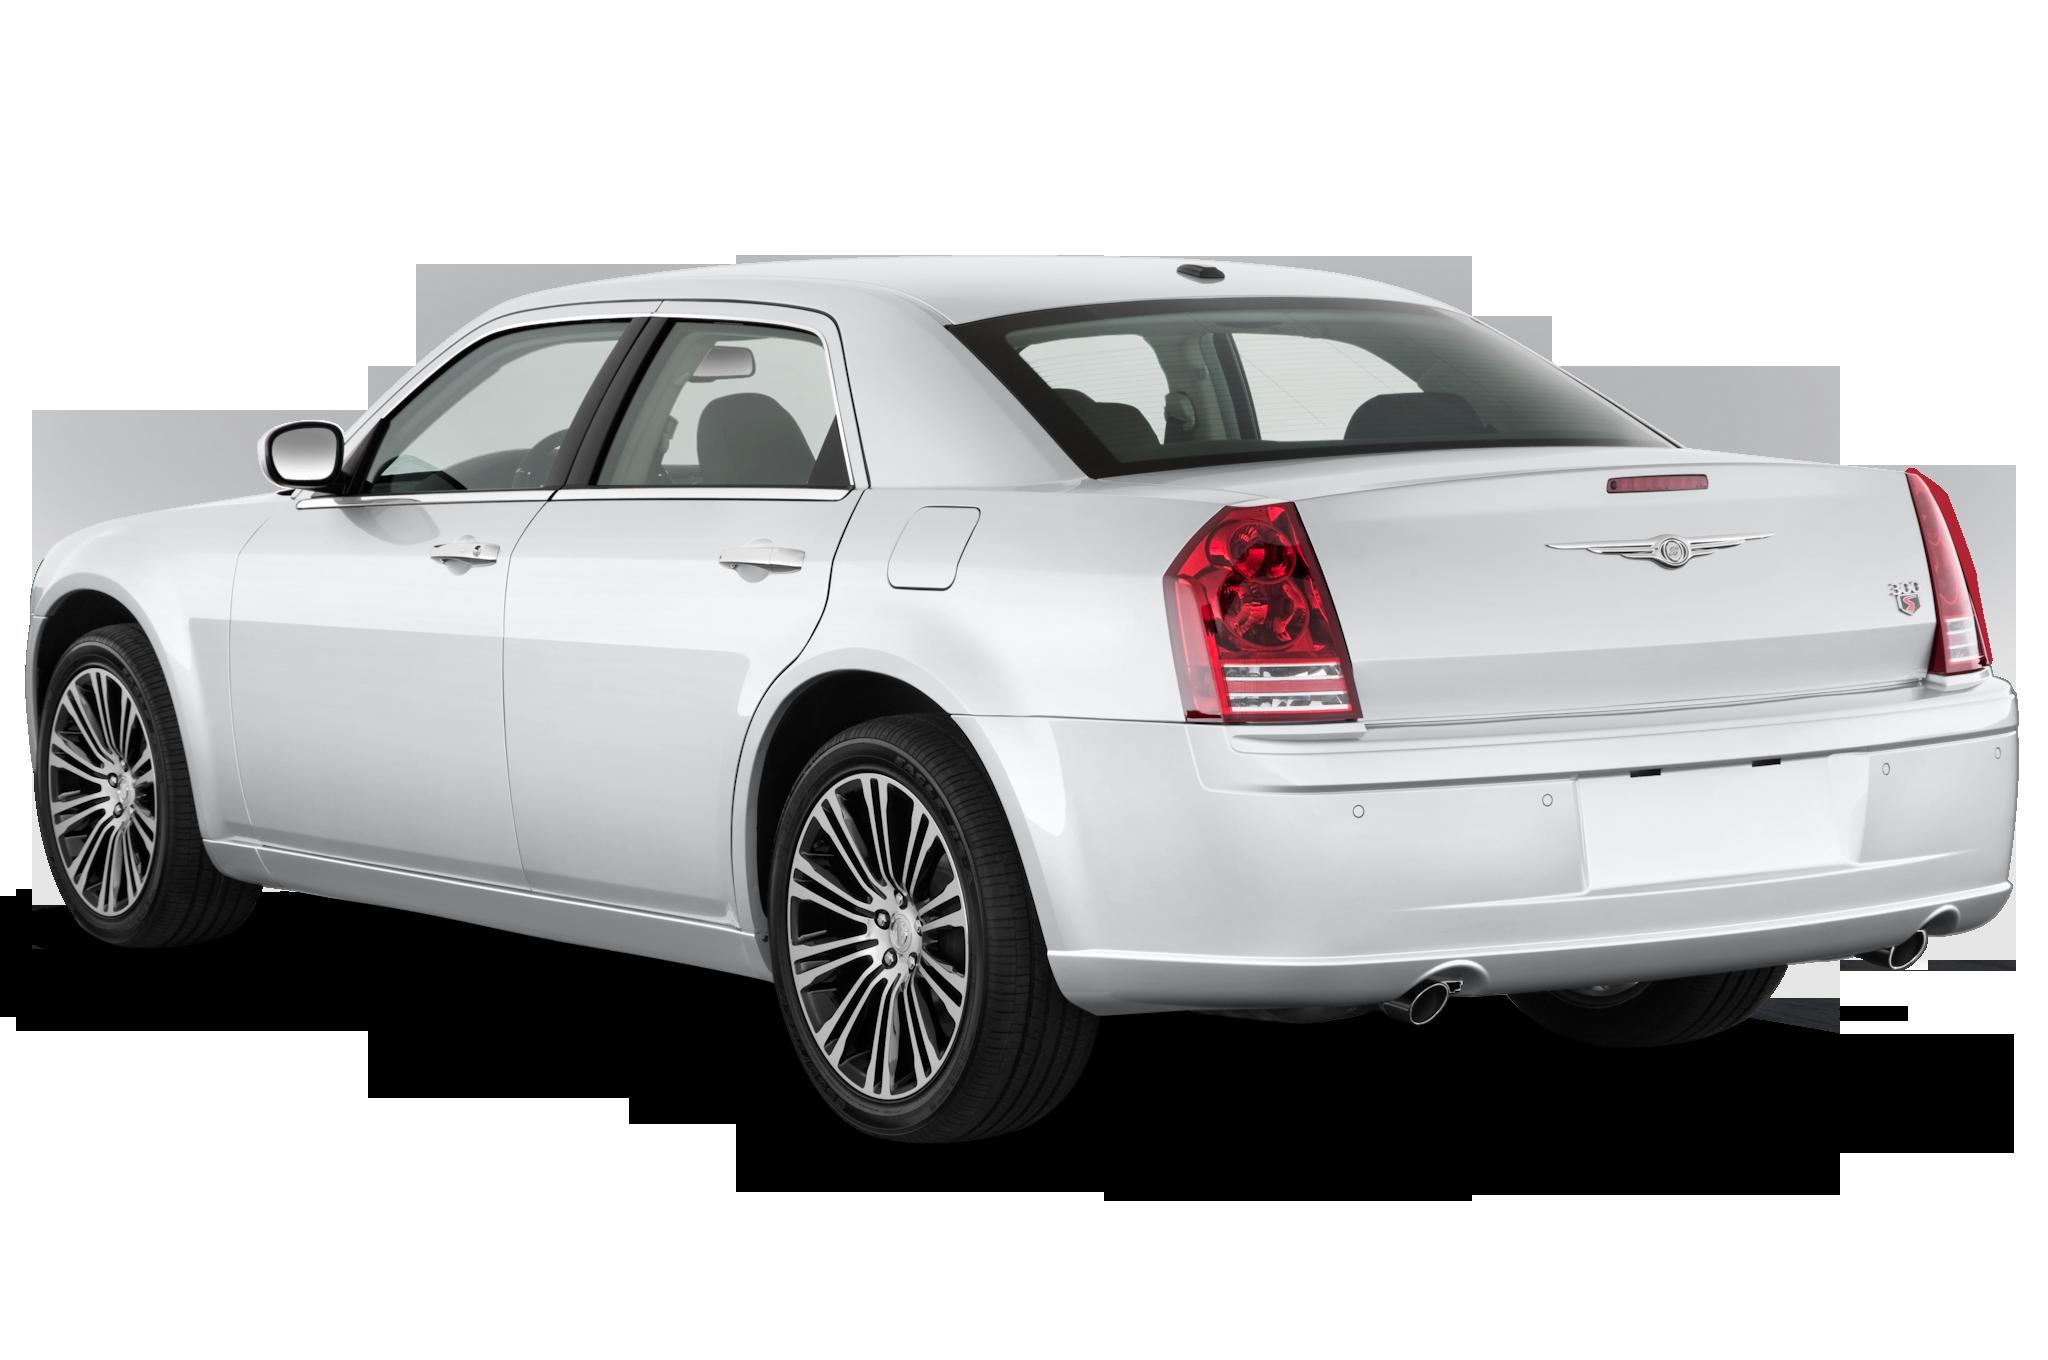 2010 chrysler 300 s v8 sedan angular rear recall central chrysler recalls expand to wrangler, minivans; bmw  at gsmportal.co